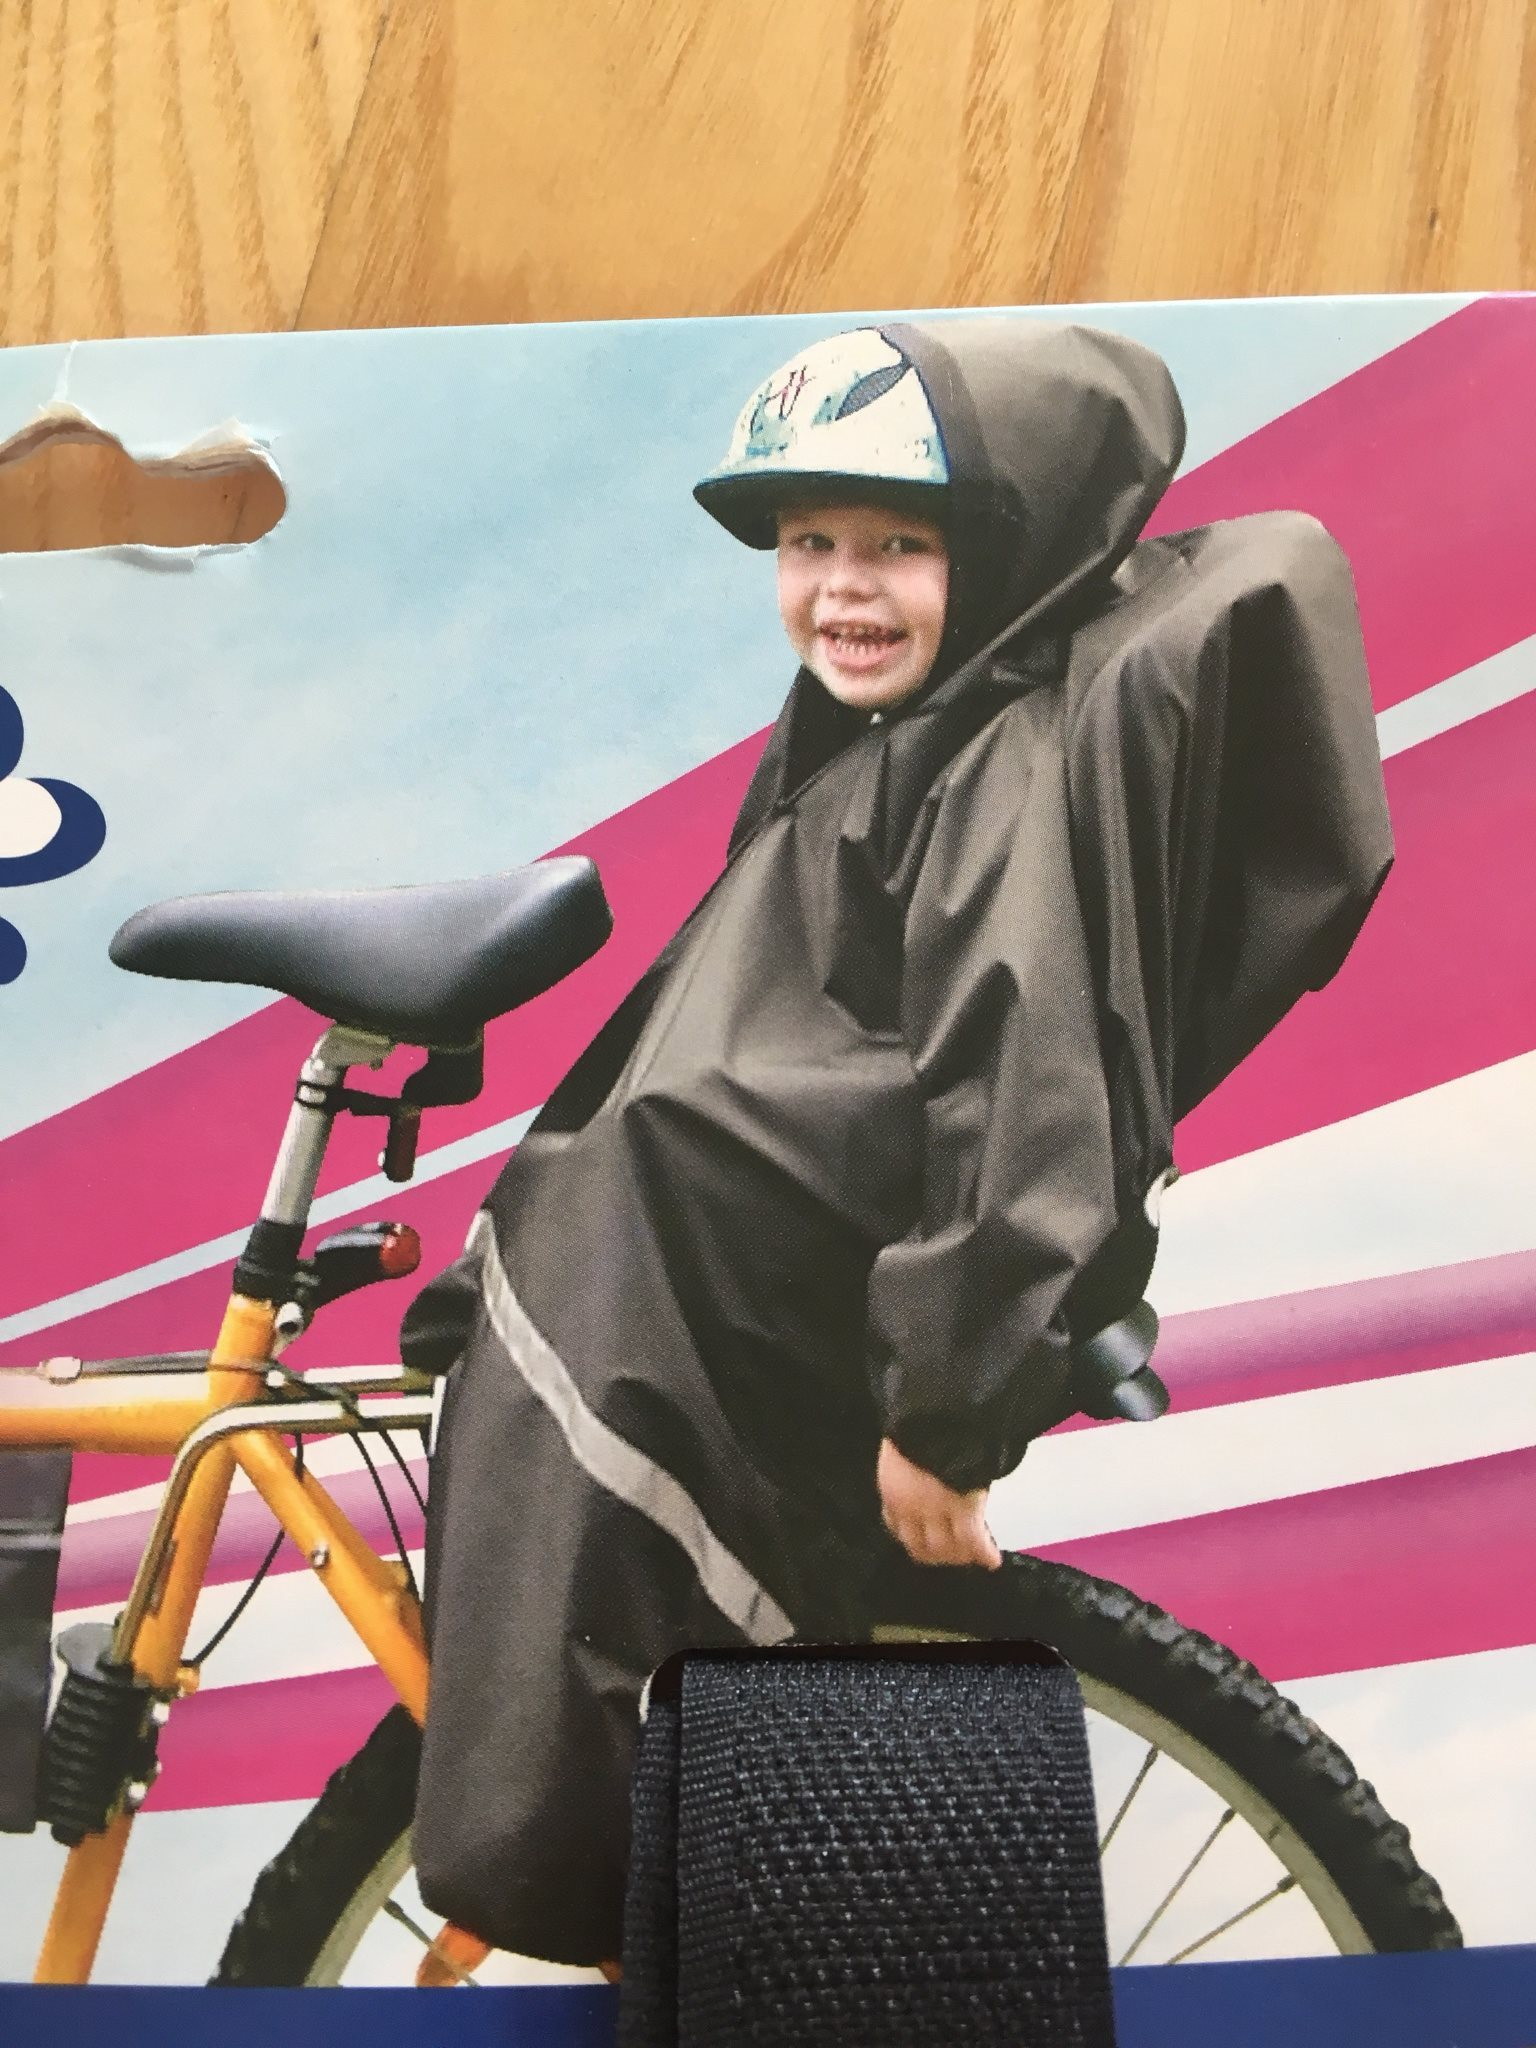 Cykelsits for barn aterkallas